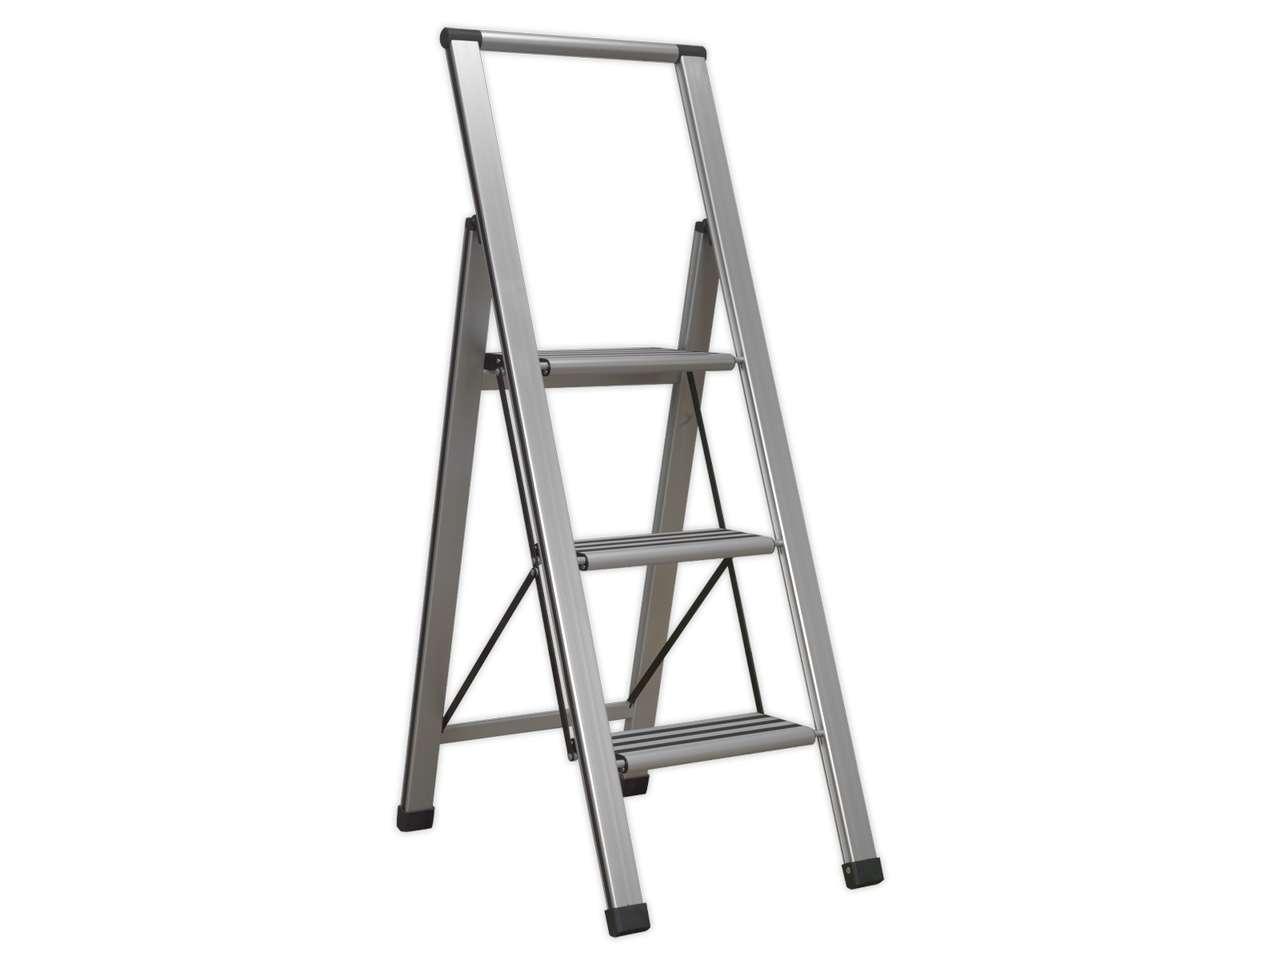 sealey apsl3 aluminium folding step ladder 3step 150kg capacity